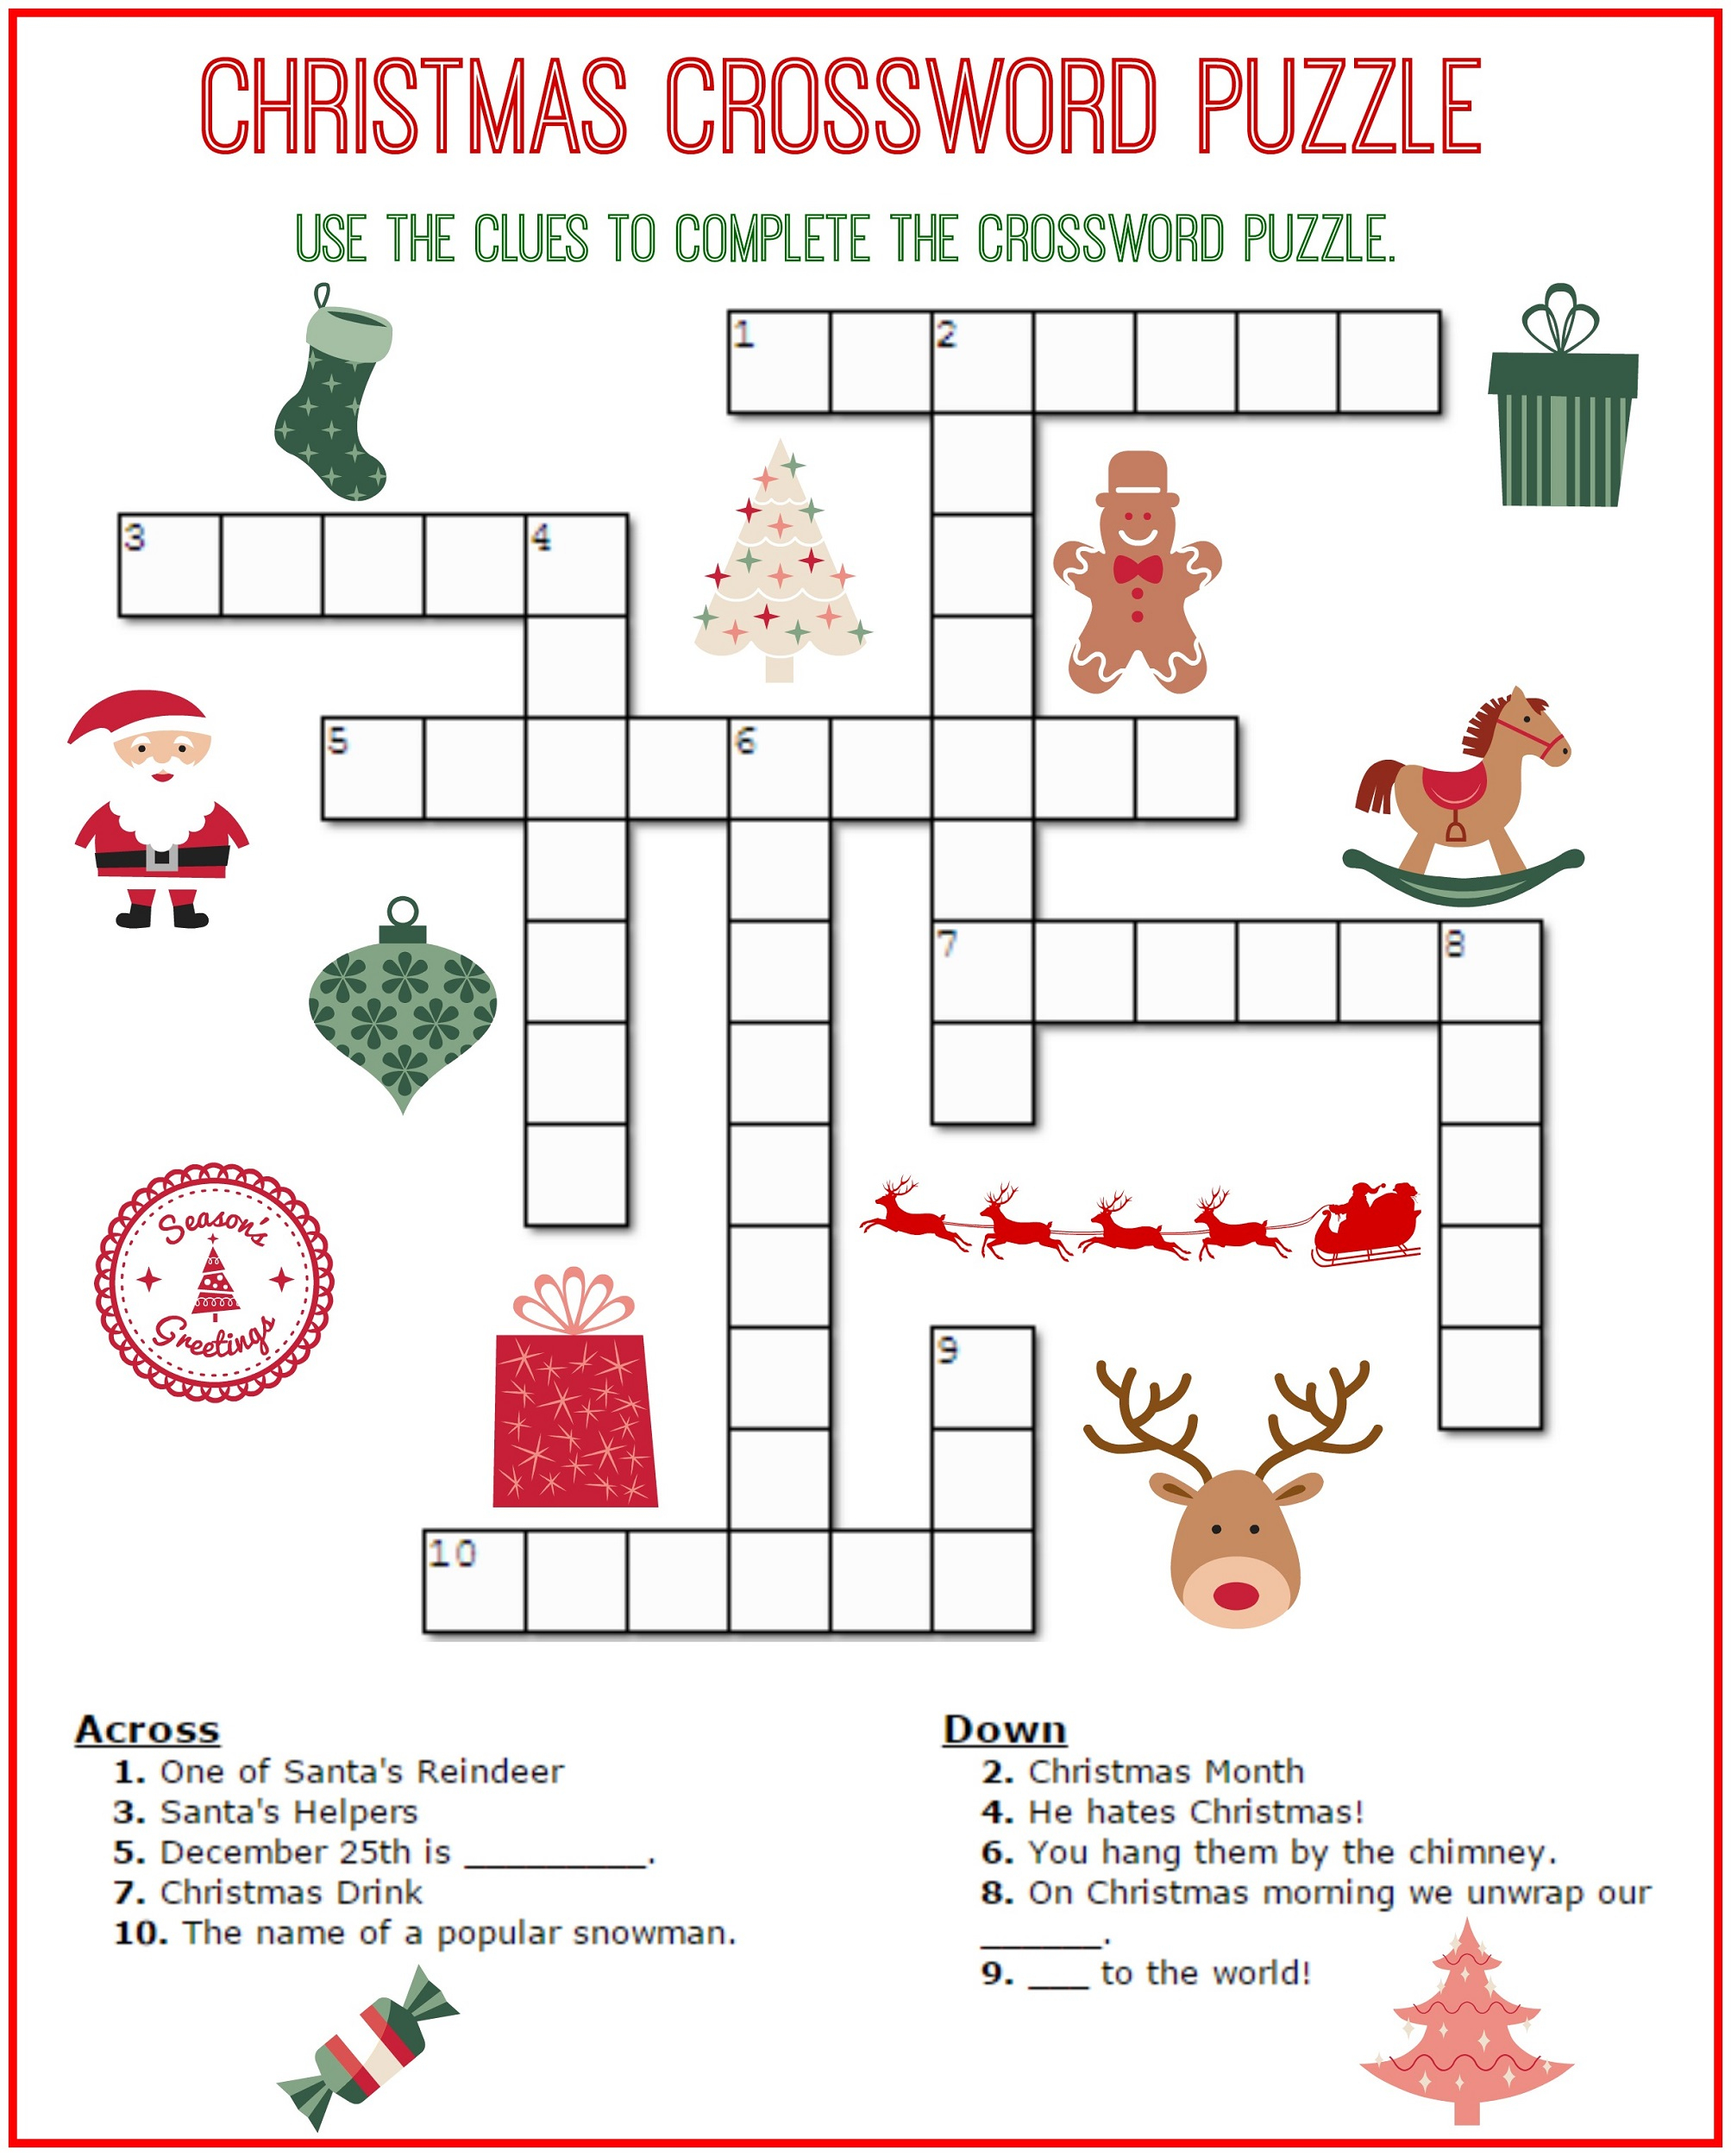 Crossword Puzzle Kids Printable 2017 | Kiddo Shelter - Printable Crossword Puzzles About Animals